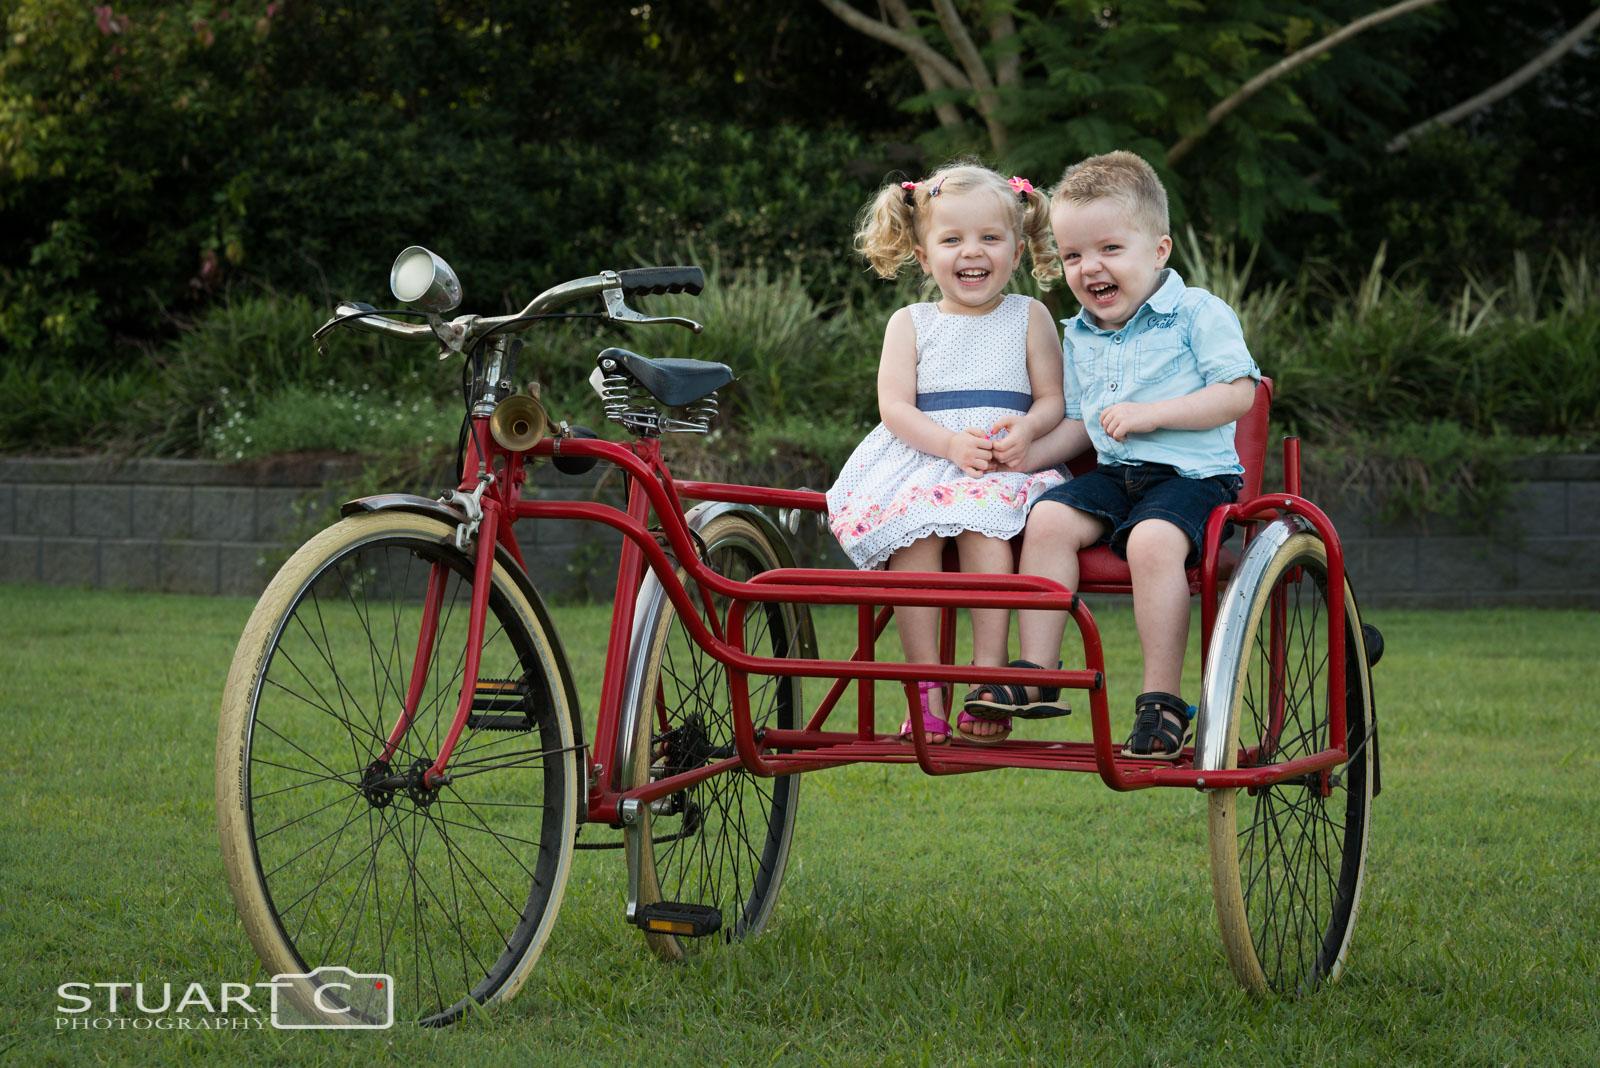 Siblings, children, kids sitting on vintage push bike with side car